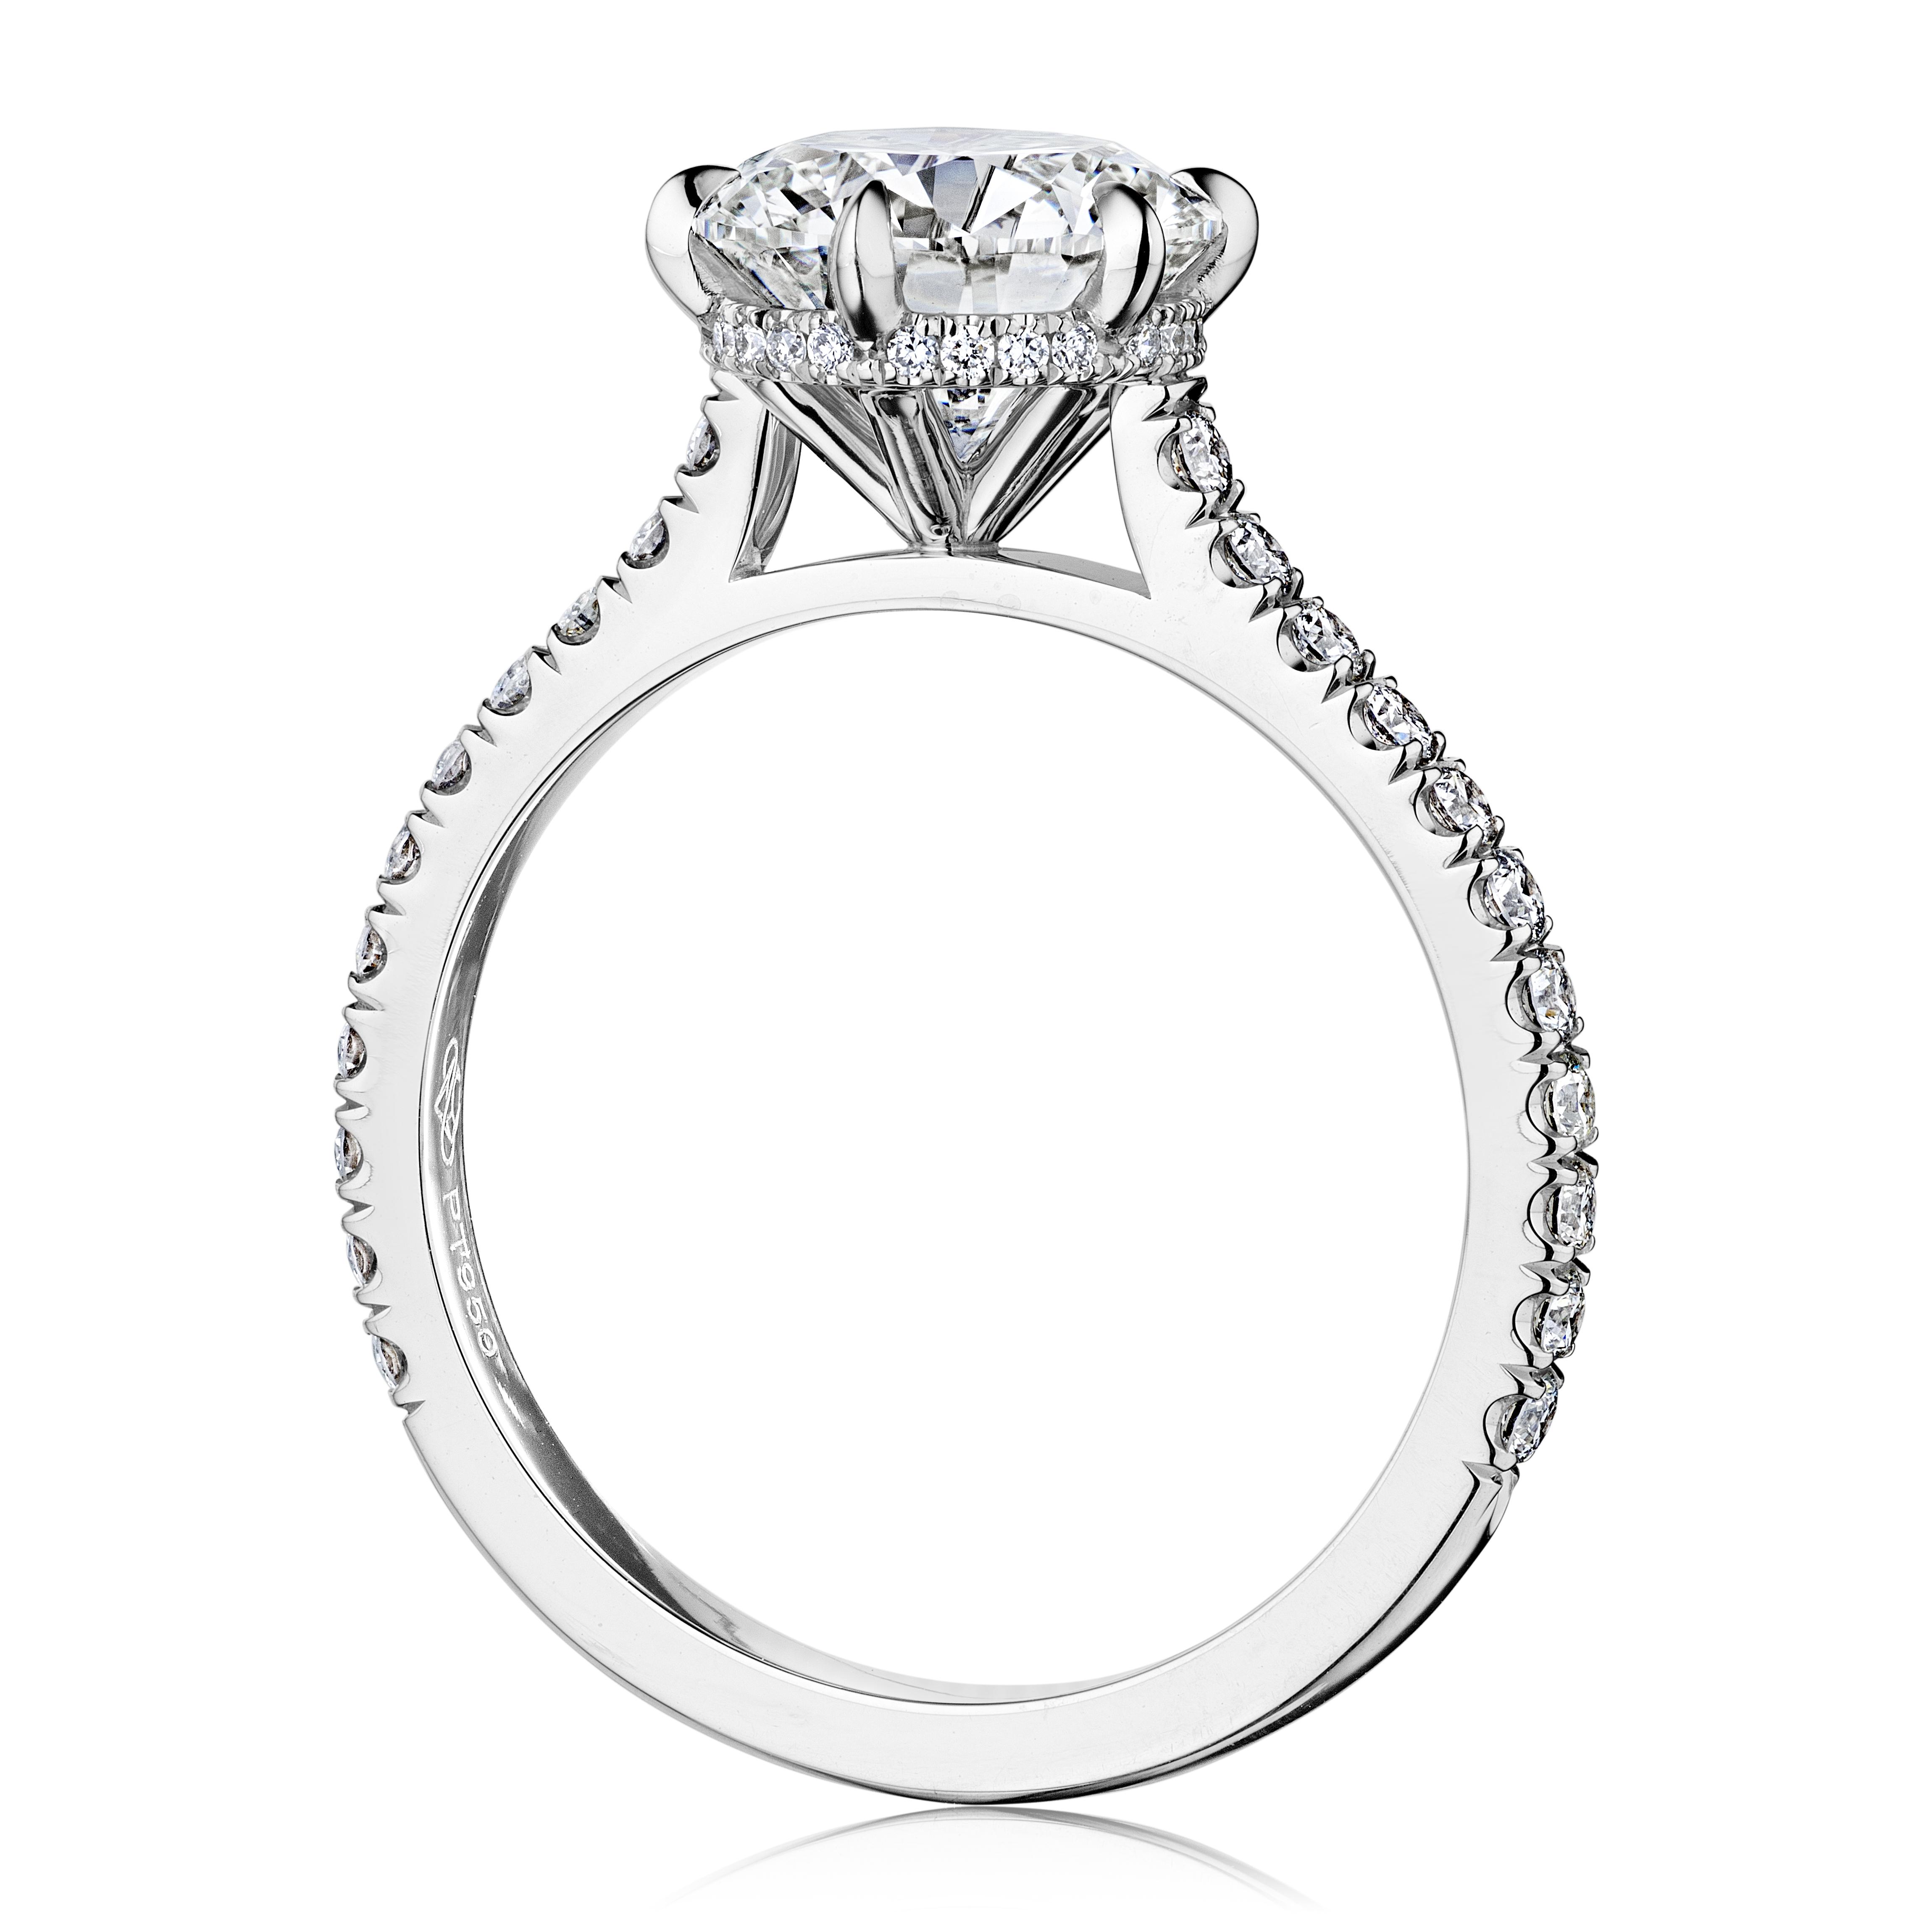 Vikky Image 2 Forever Diamonds New York, NY